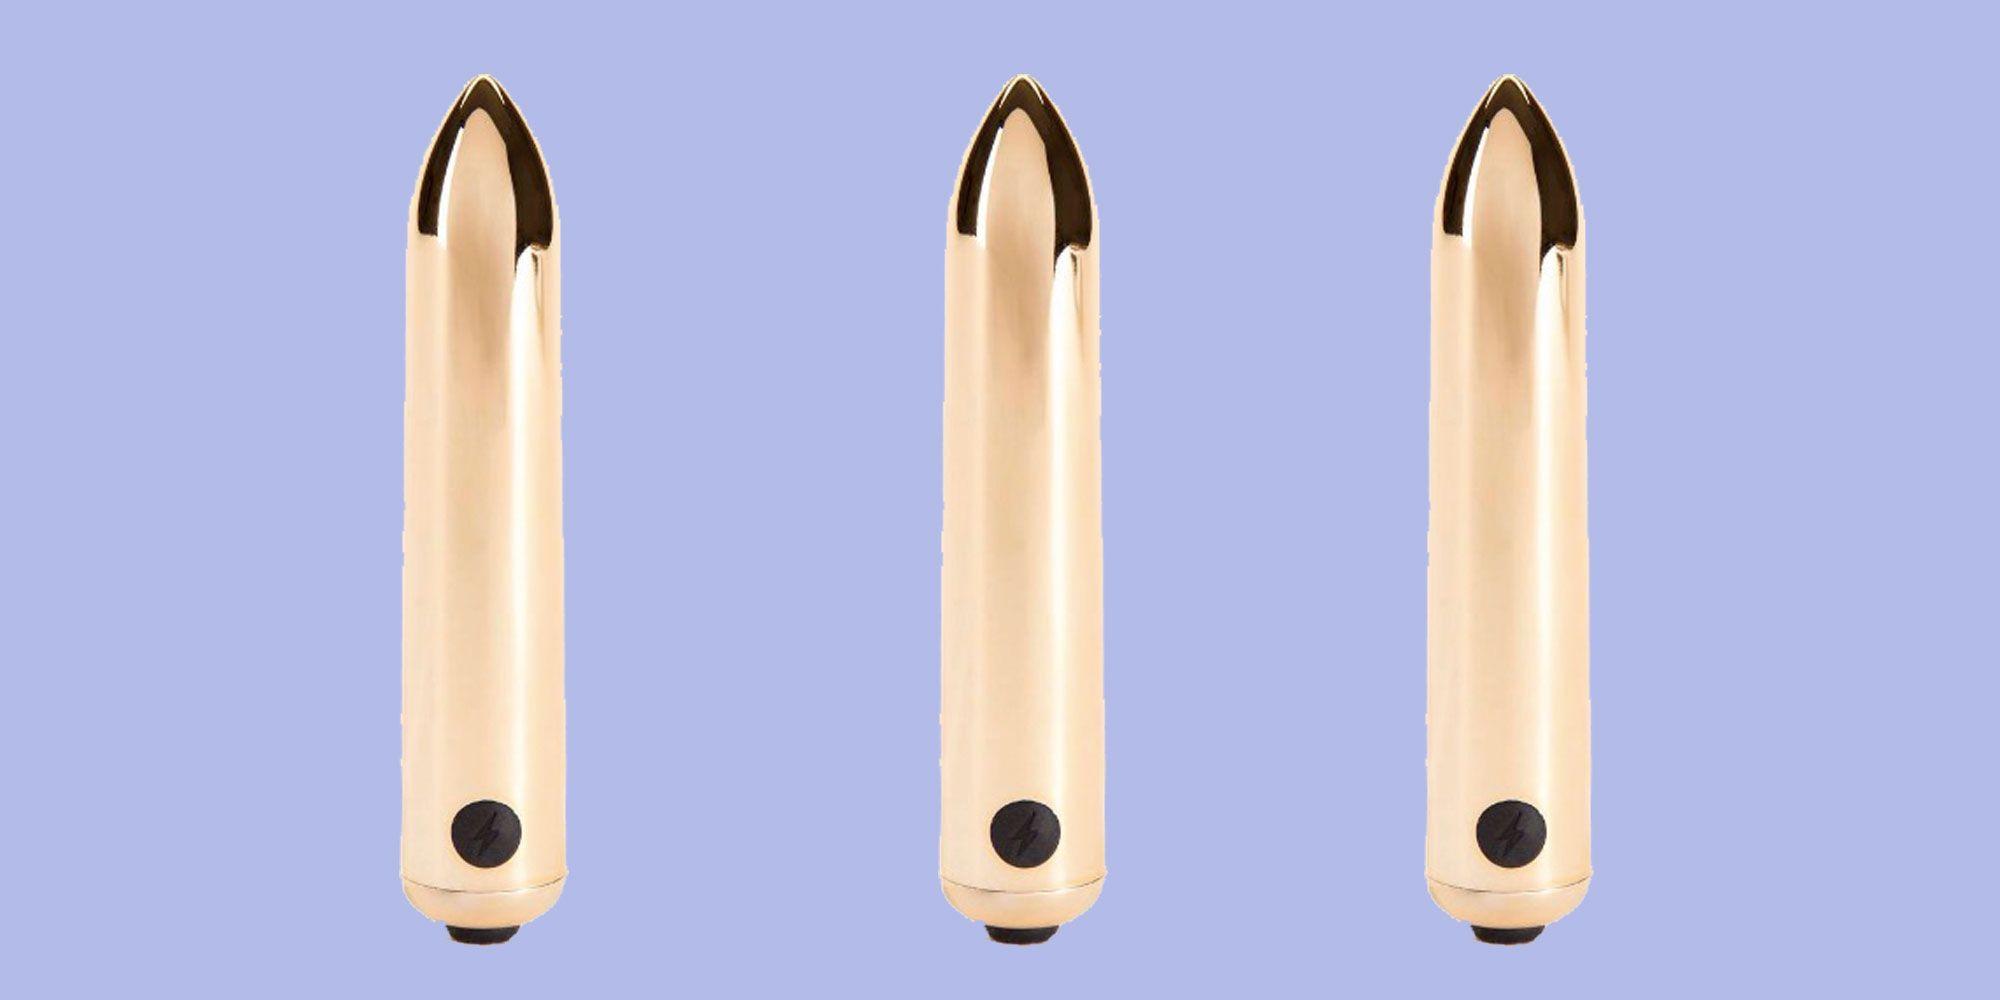 Sex toys for couples -Rocks Off Bullet Vibrator from Lovehoney